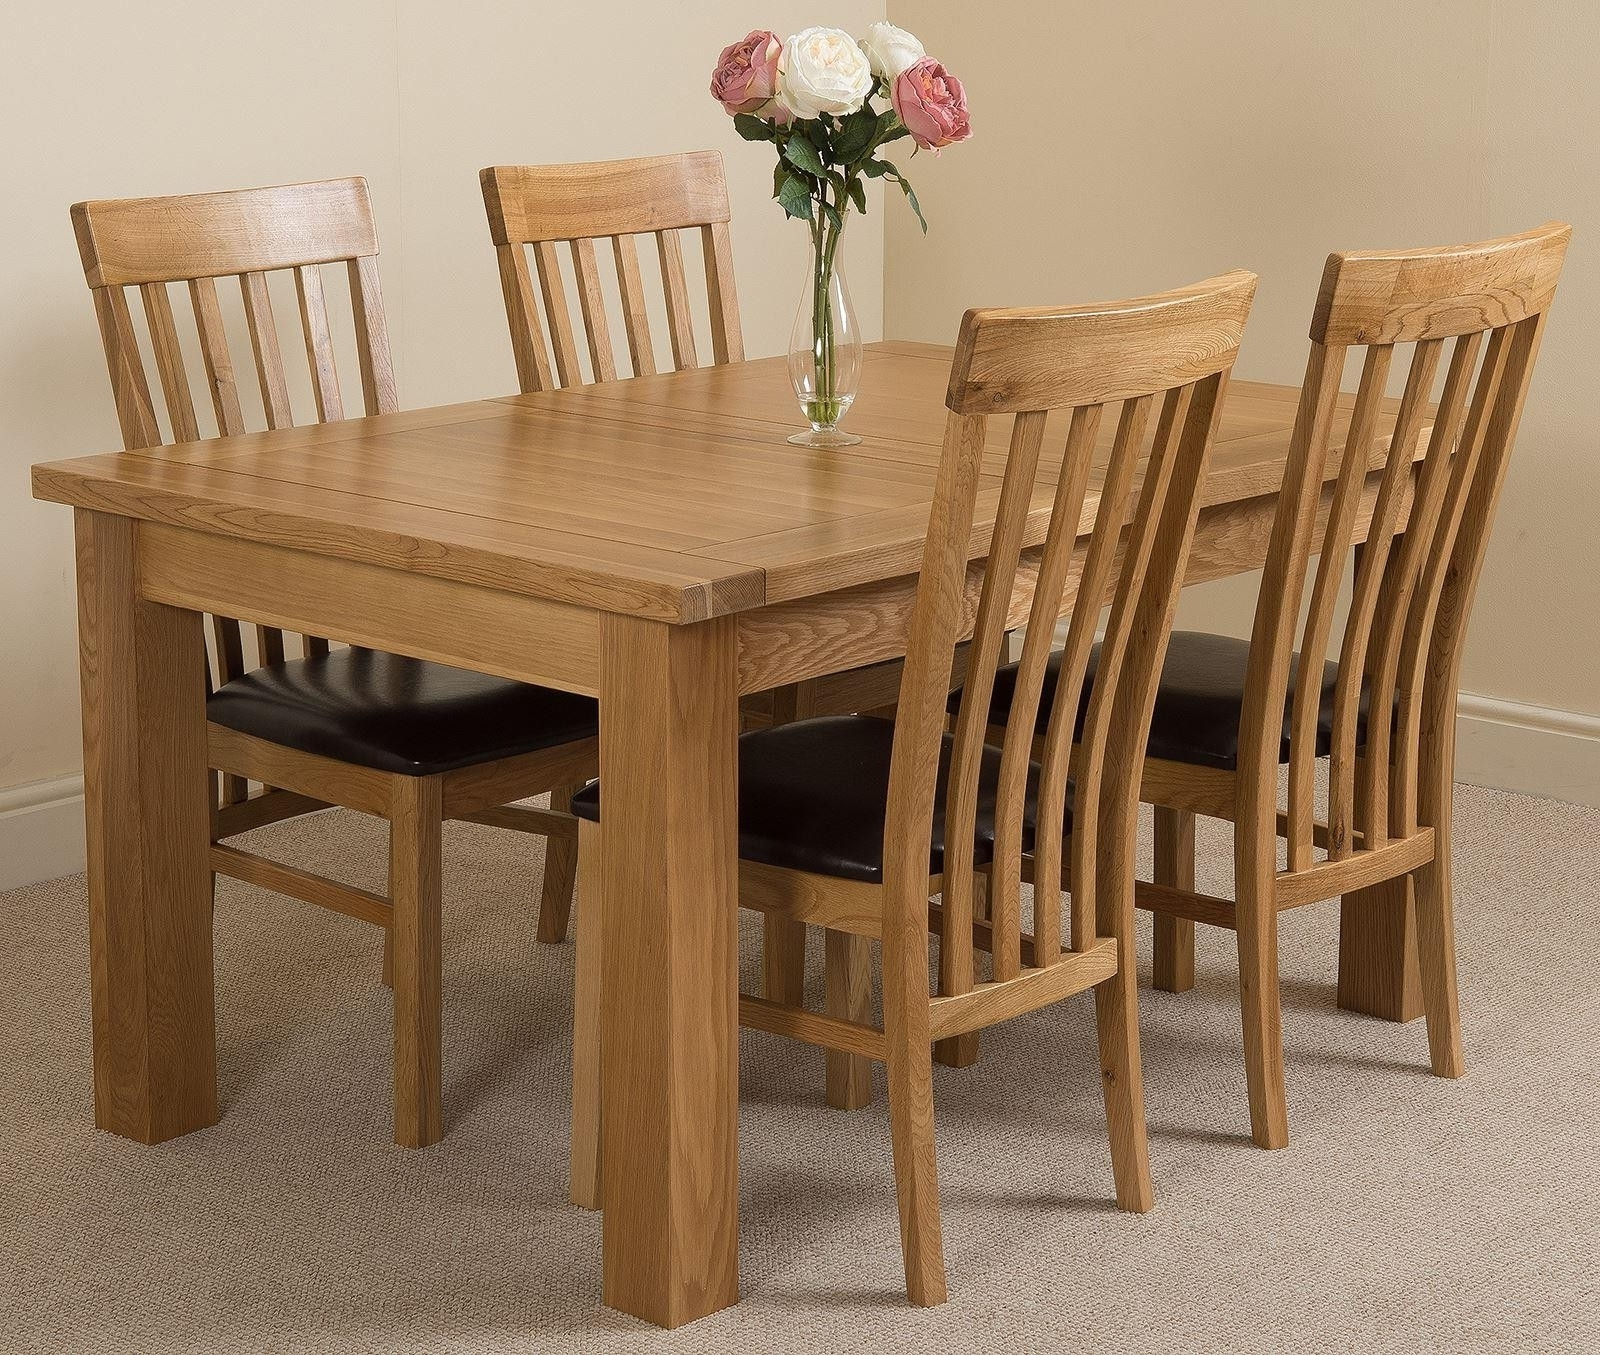 Oak Furniture King (View 9 of 25)